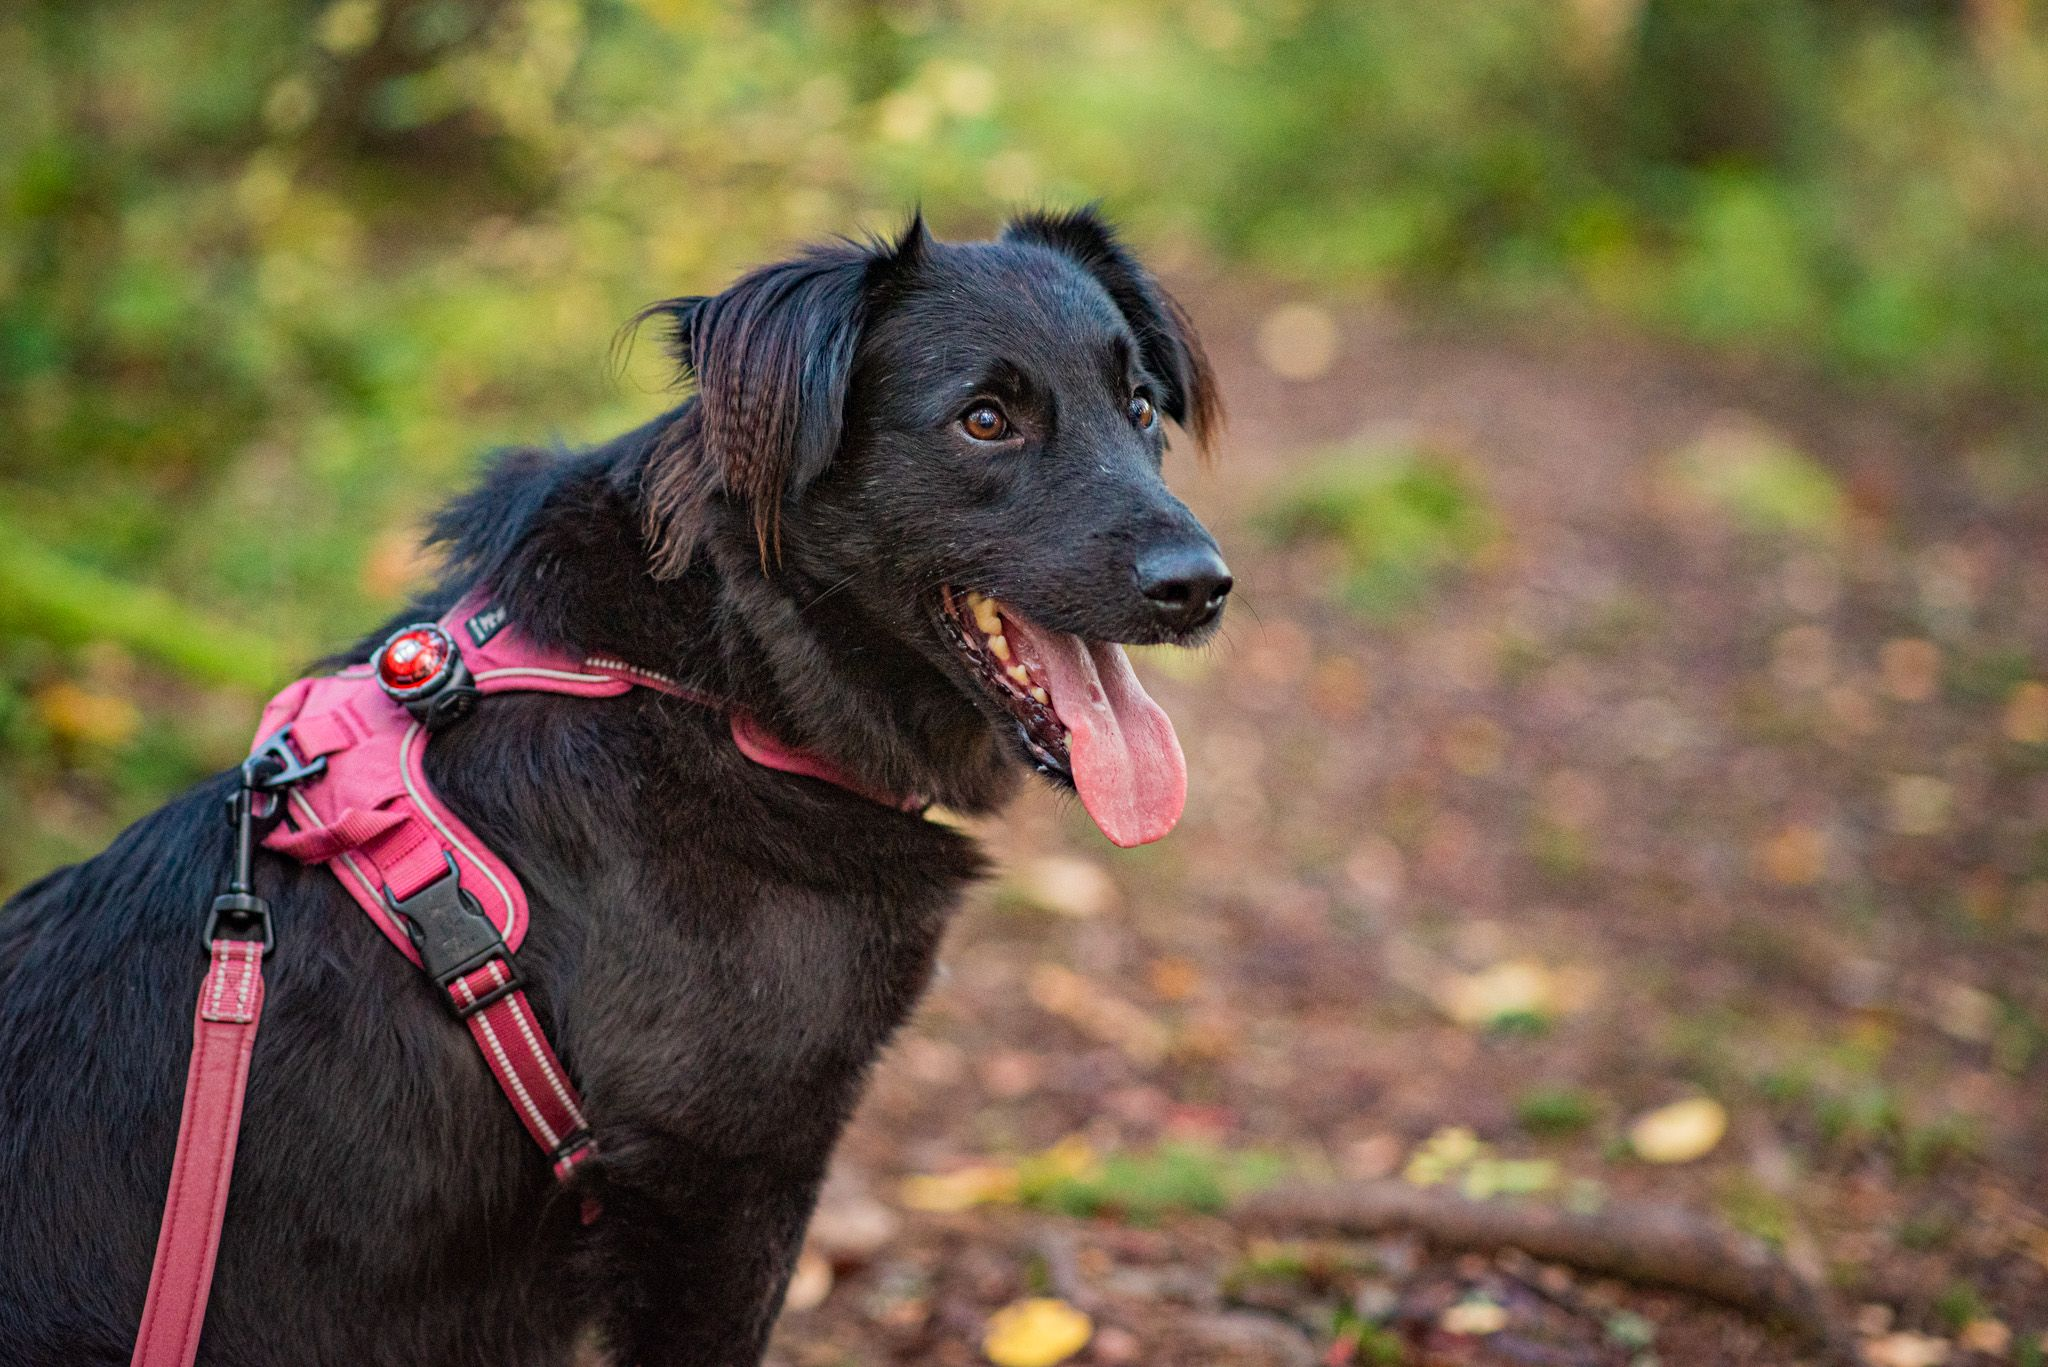 musta koira hihnassa